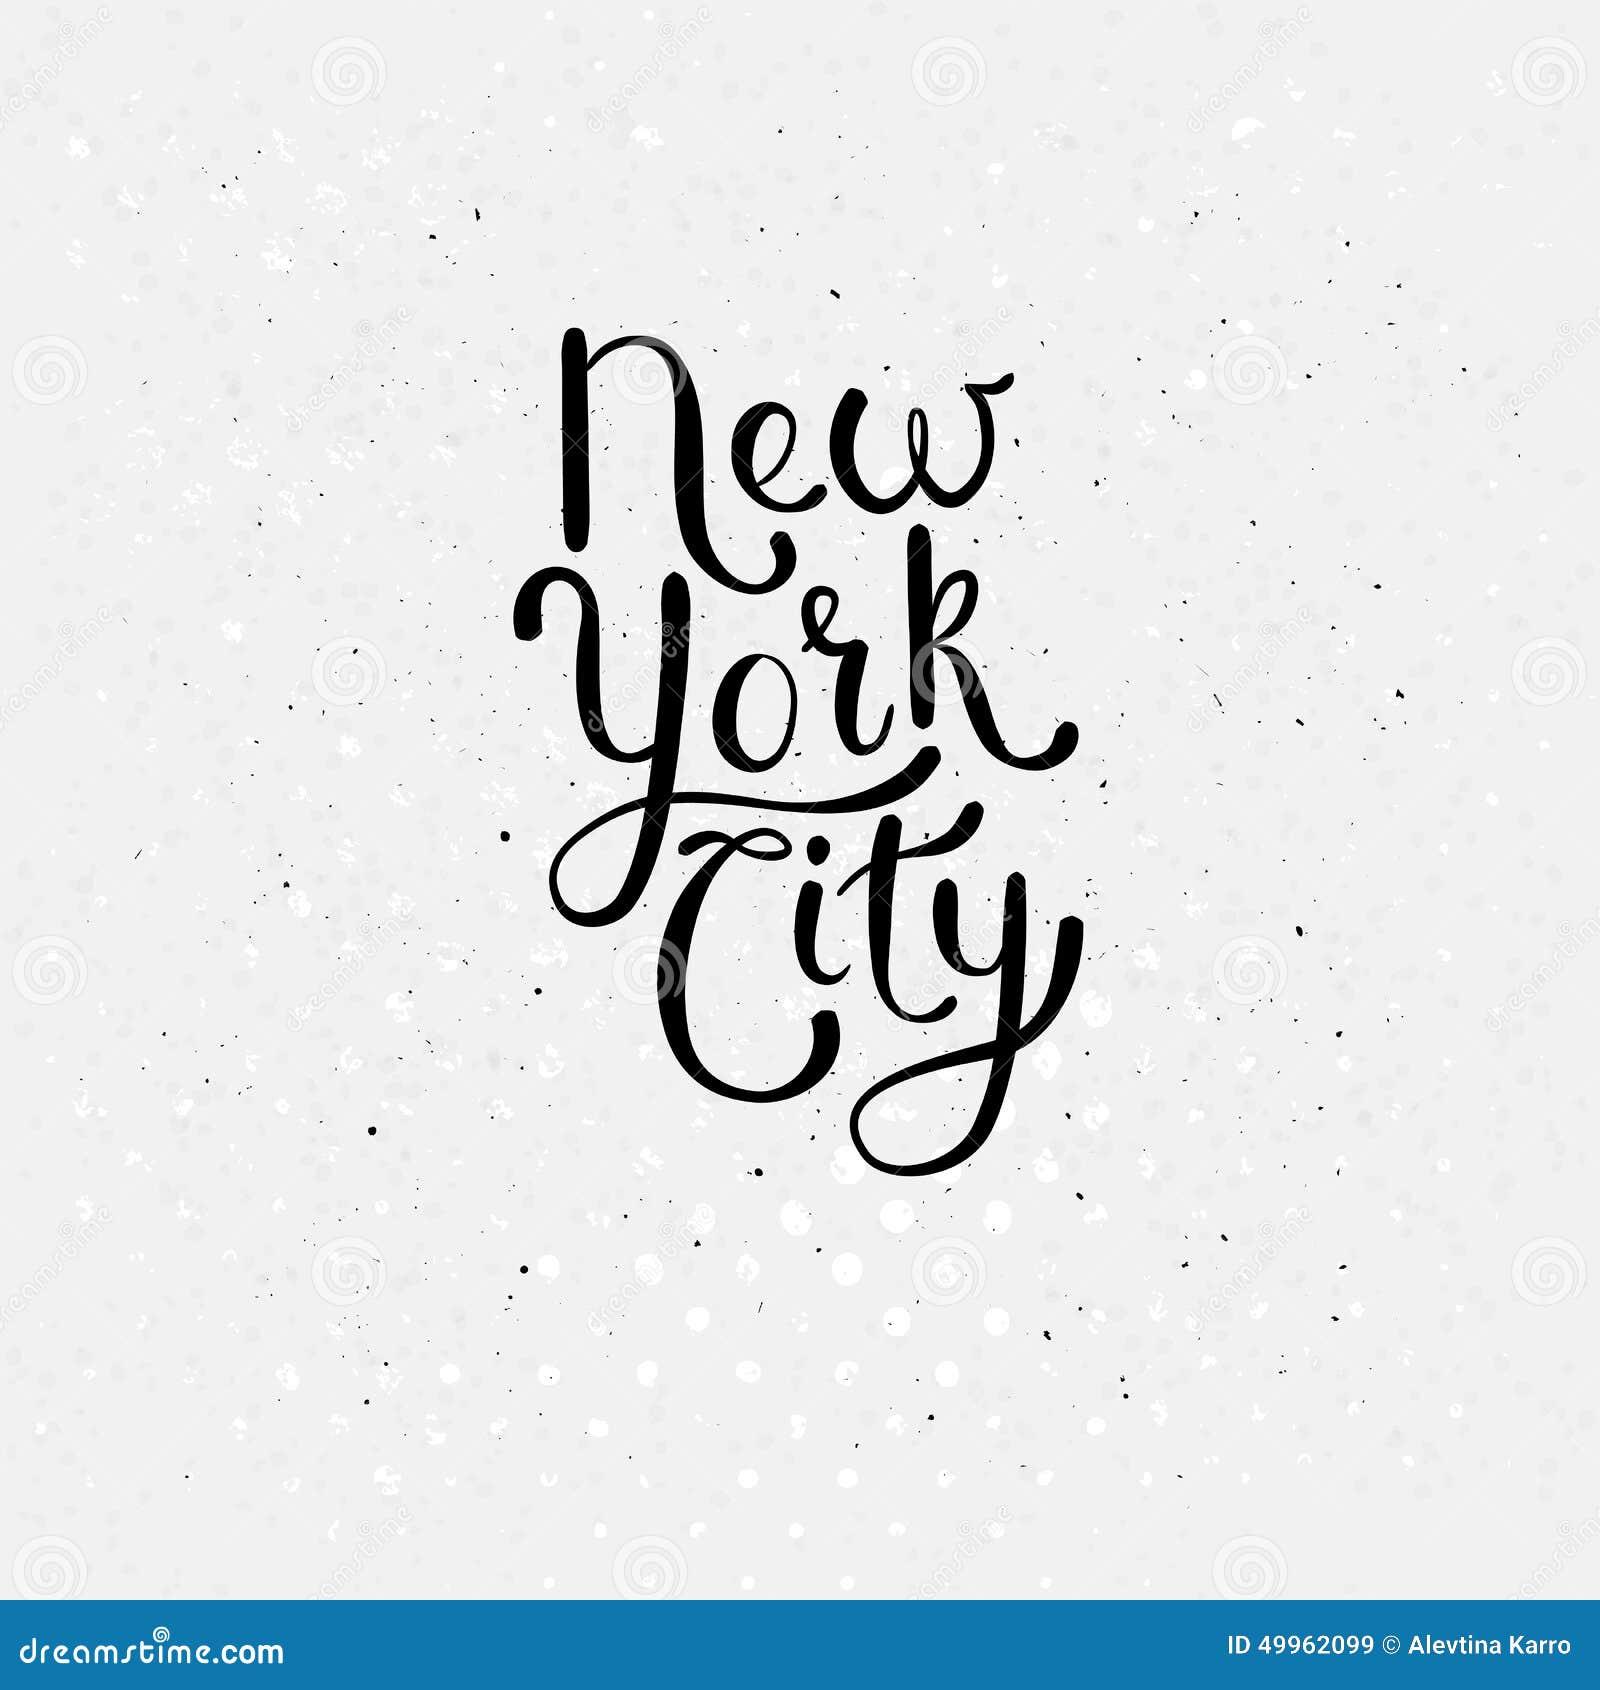 New york desi dating